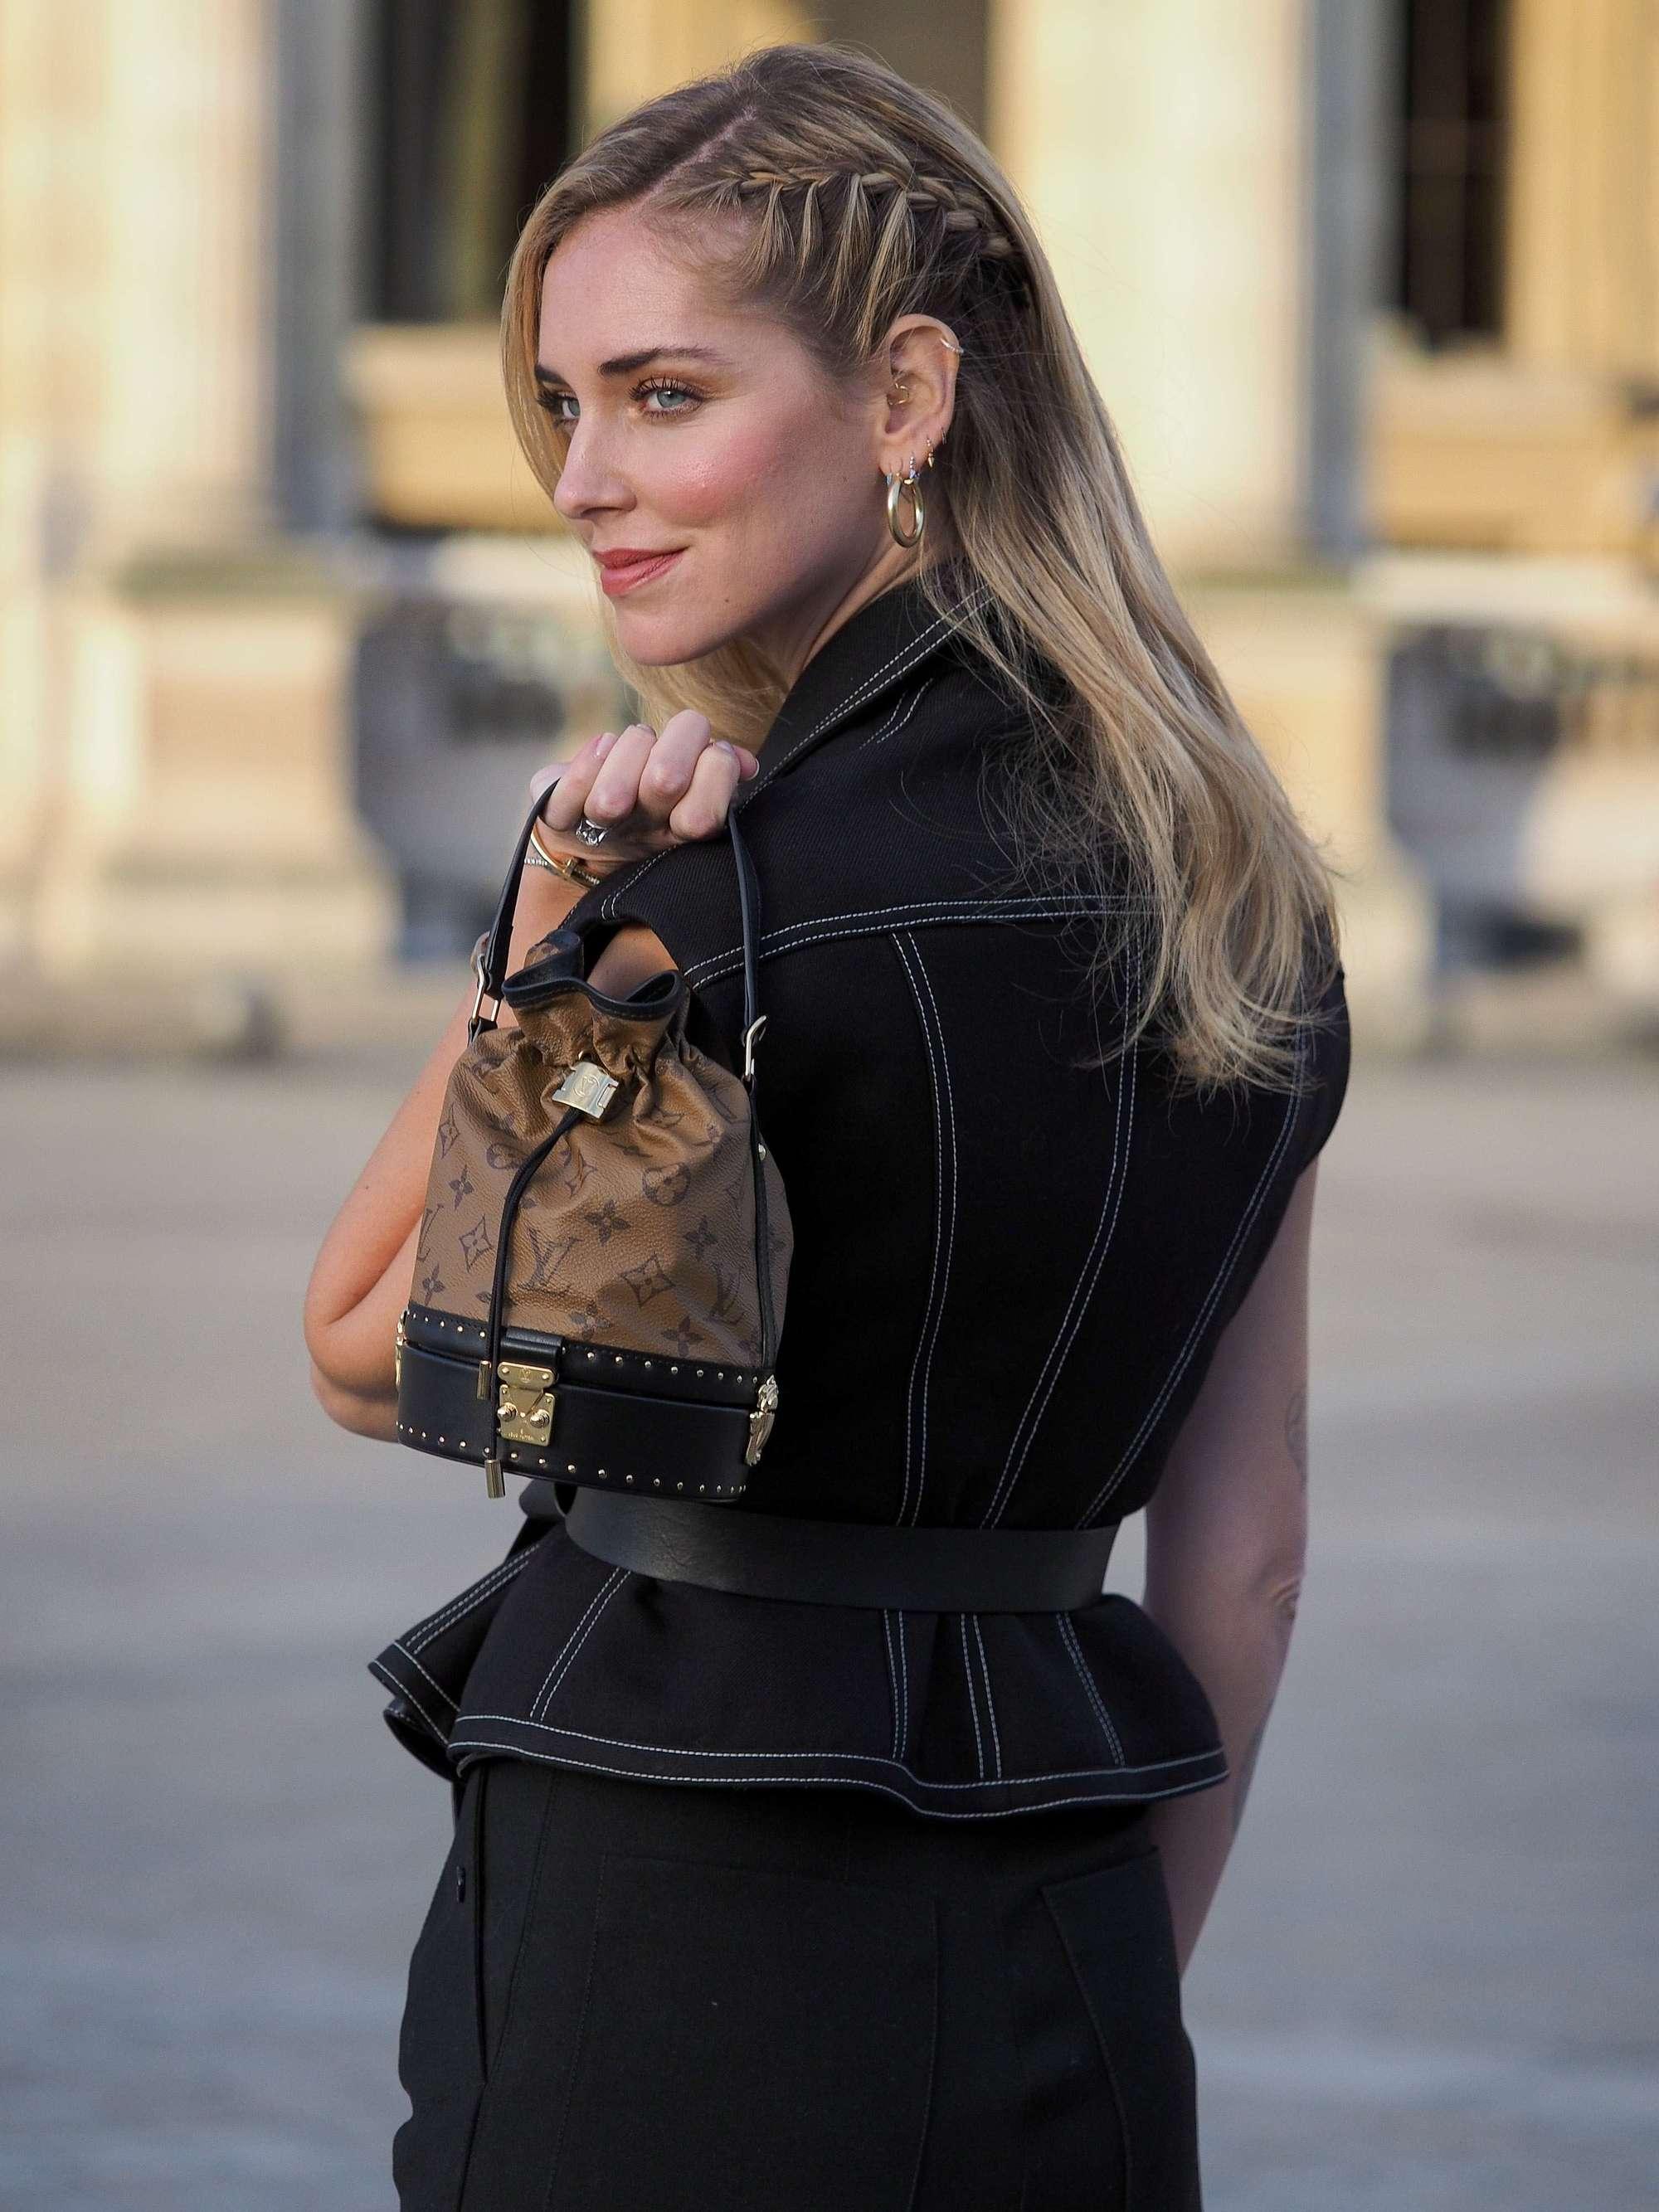 Side braid hairstyles: Chiara Ferragni with long straight blonde hair with side cornrow braids